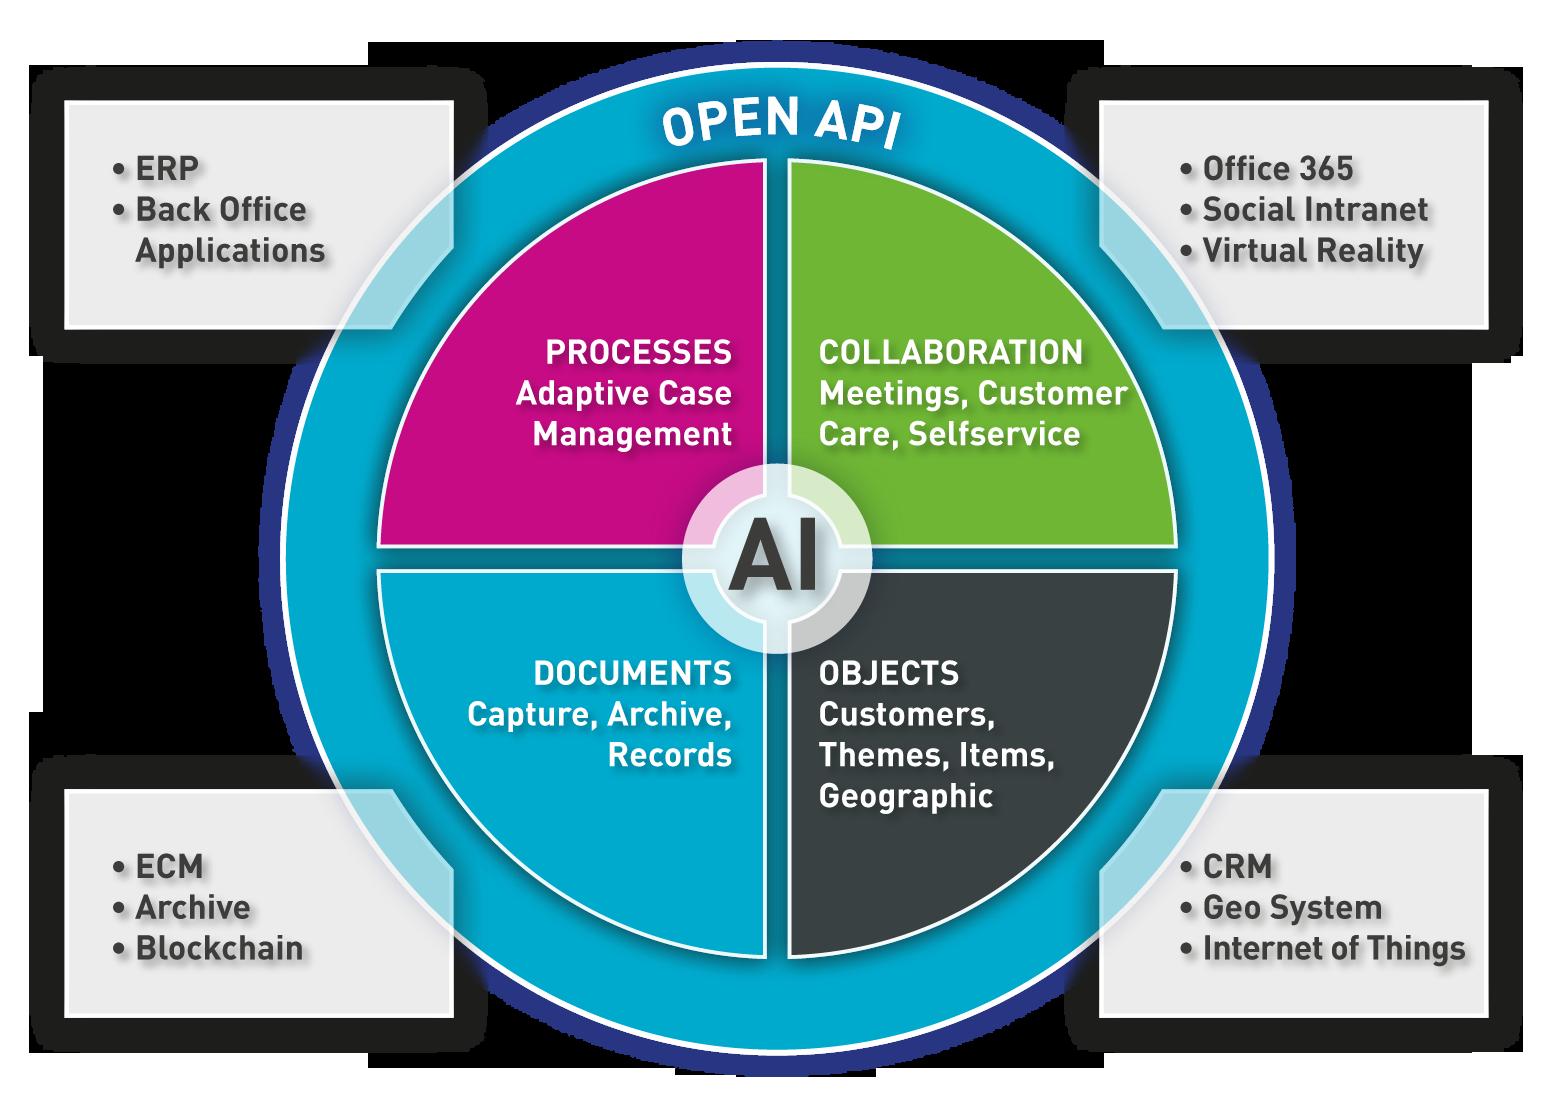 Schema Enterprise Information Management Technology - BCT